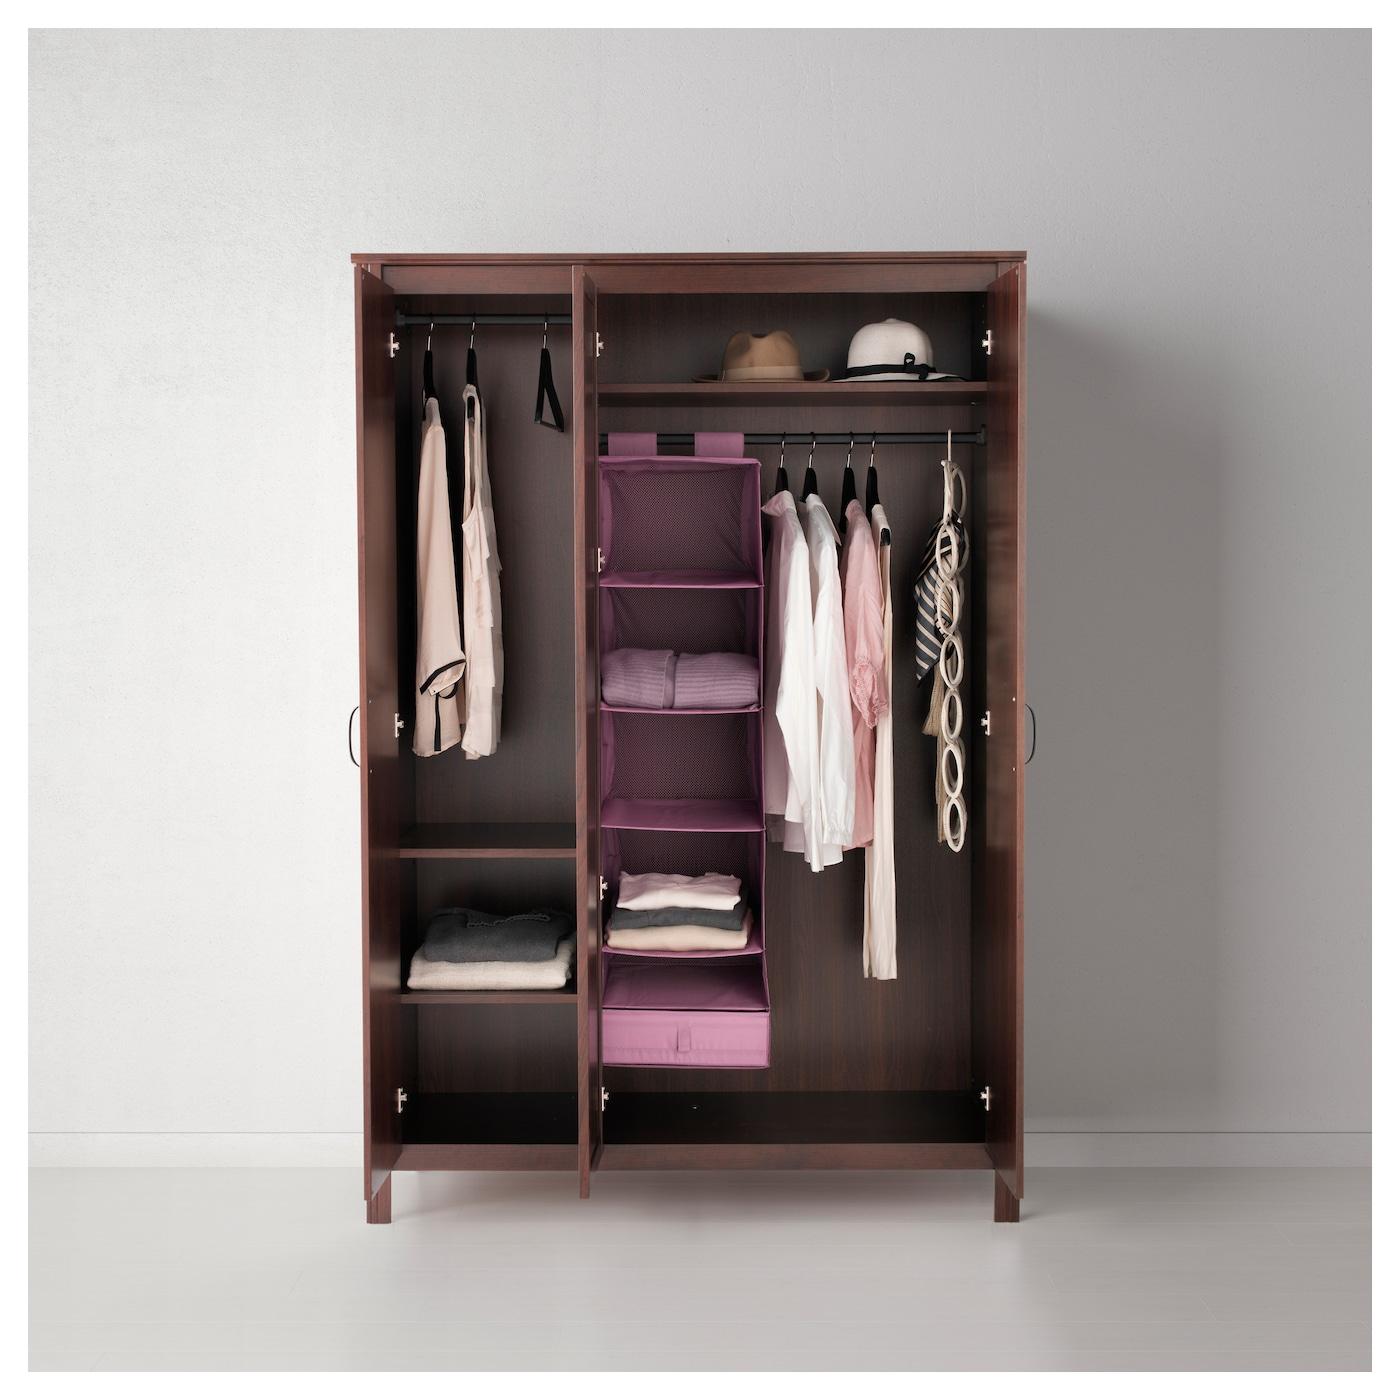 784b5e ikea brusali wardrobe with 3 doors adjustable hinges ensure that the save image